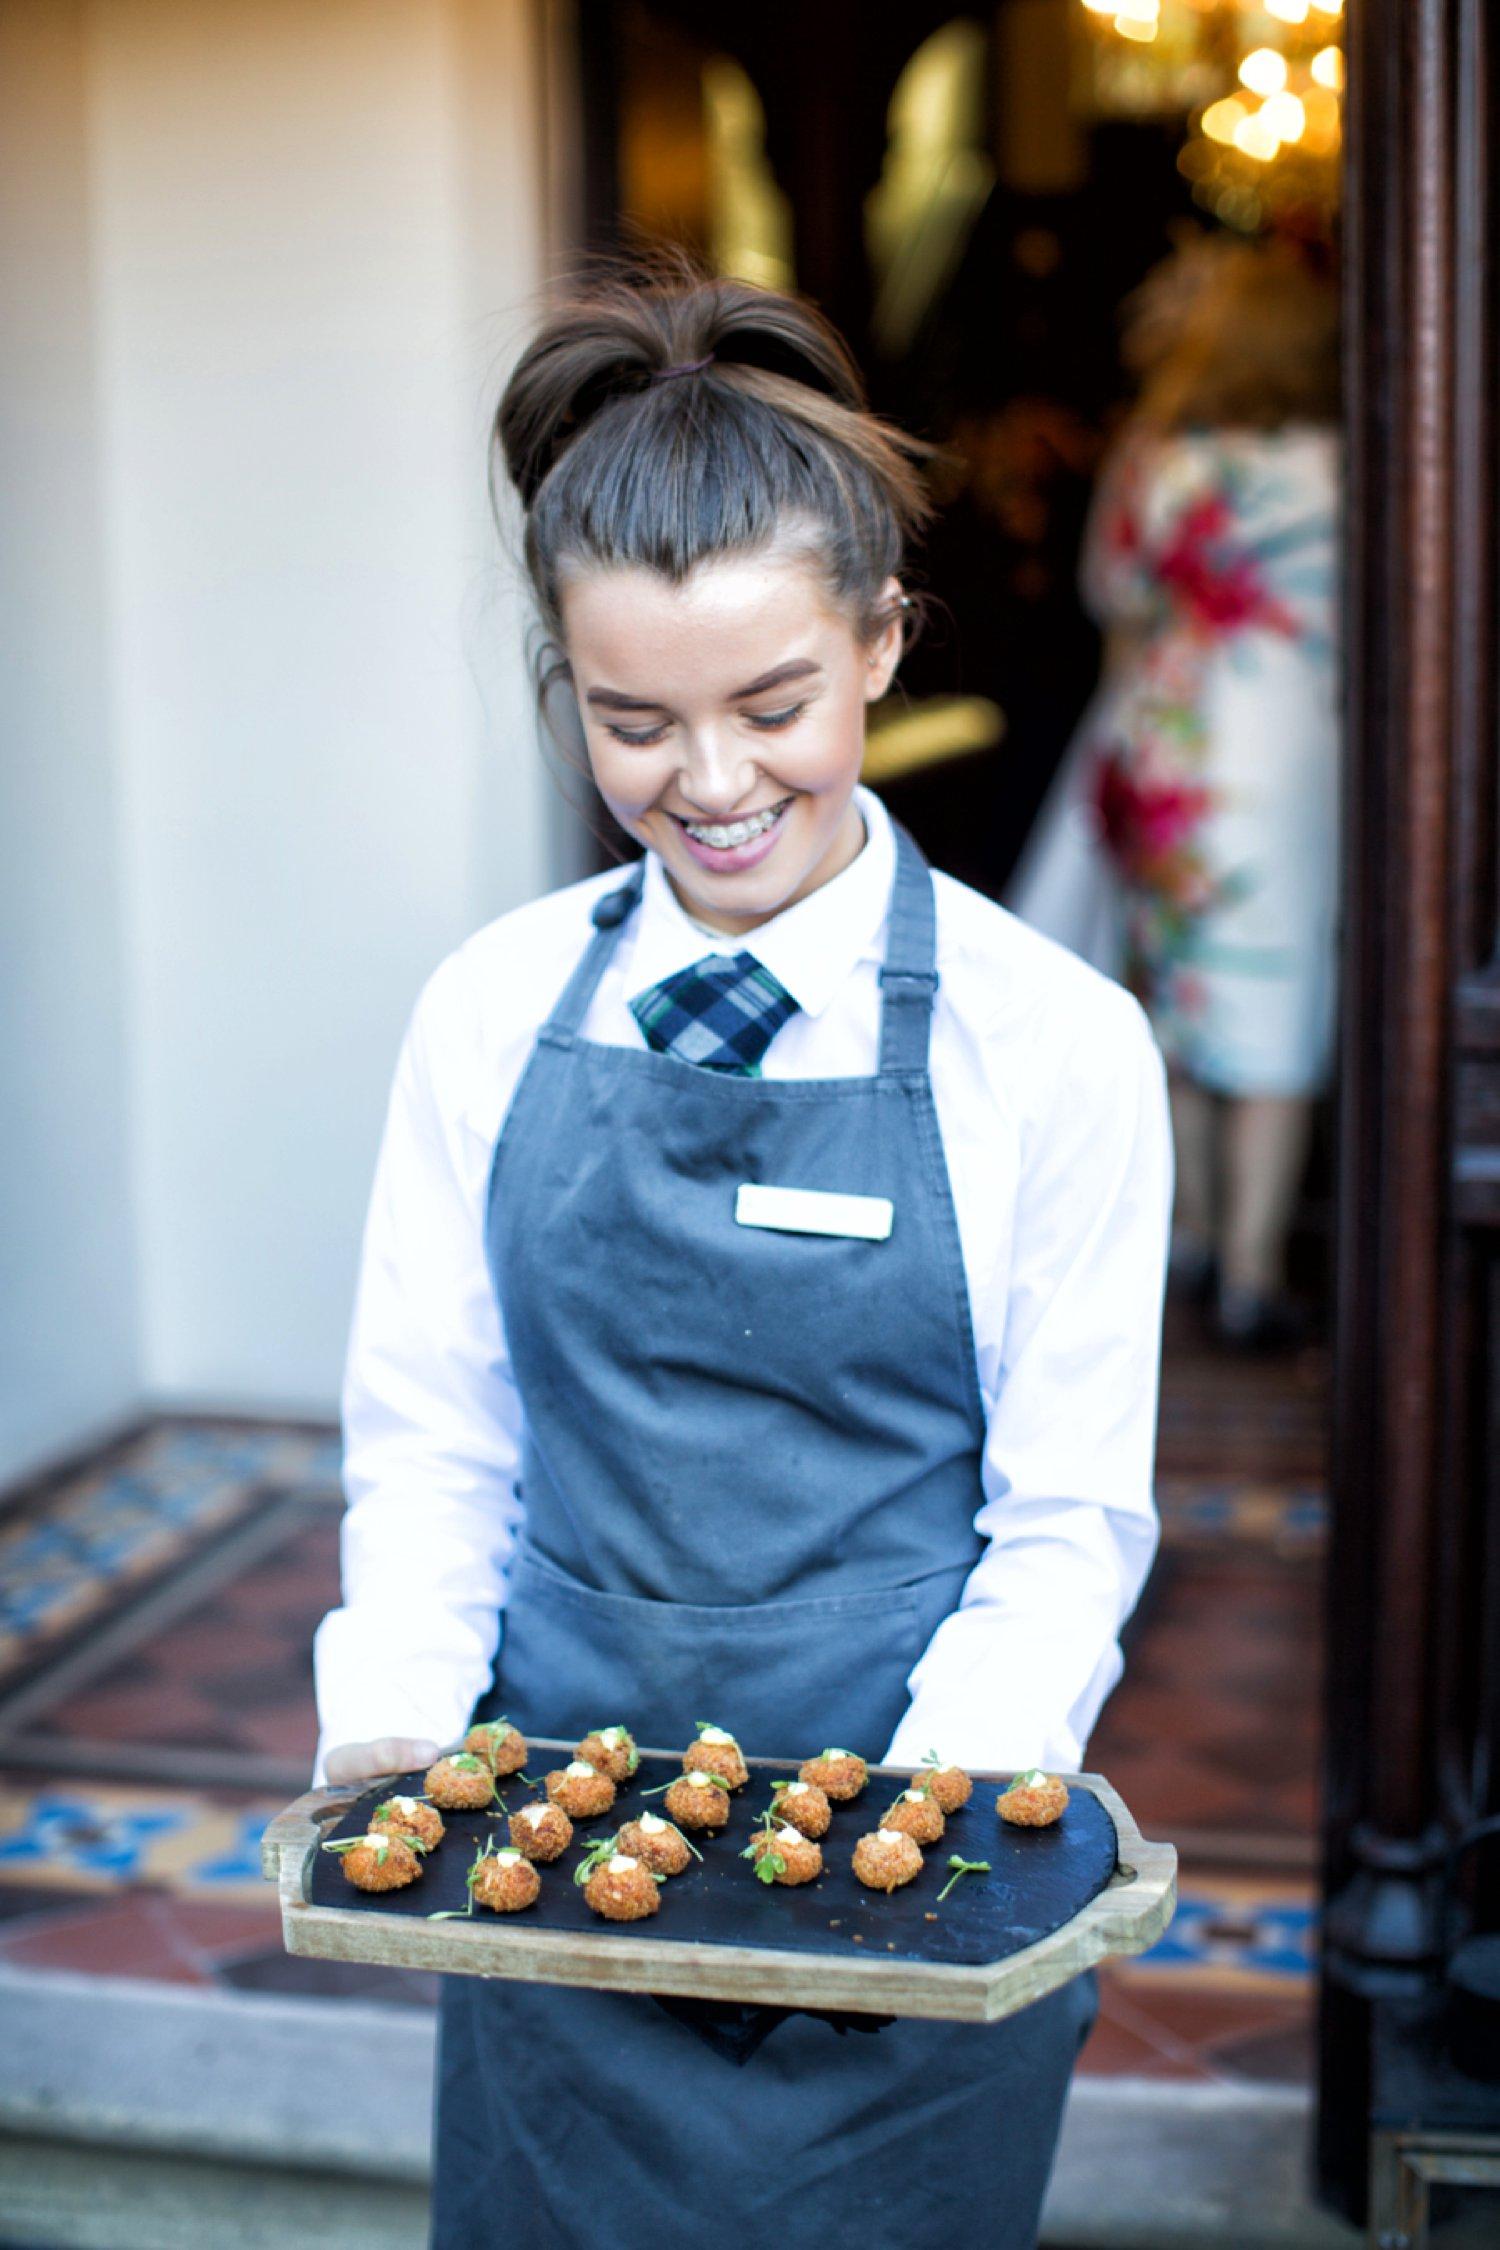 staff serving canapés